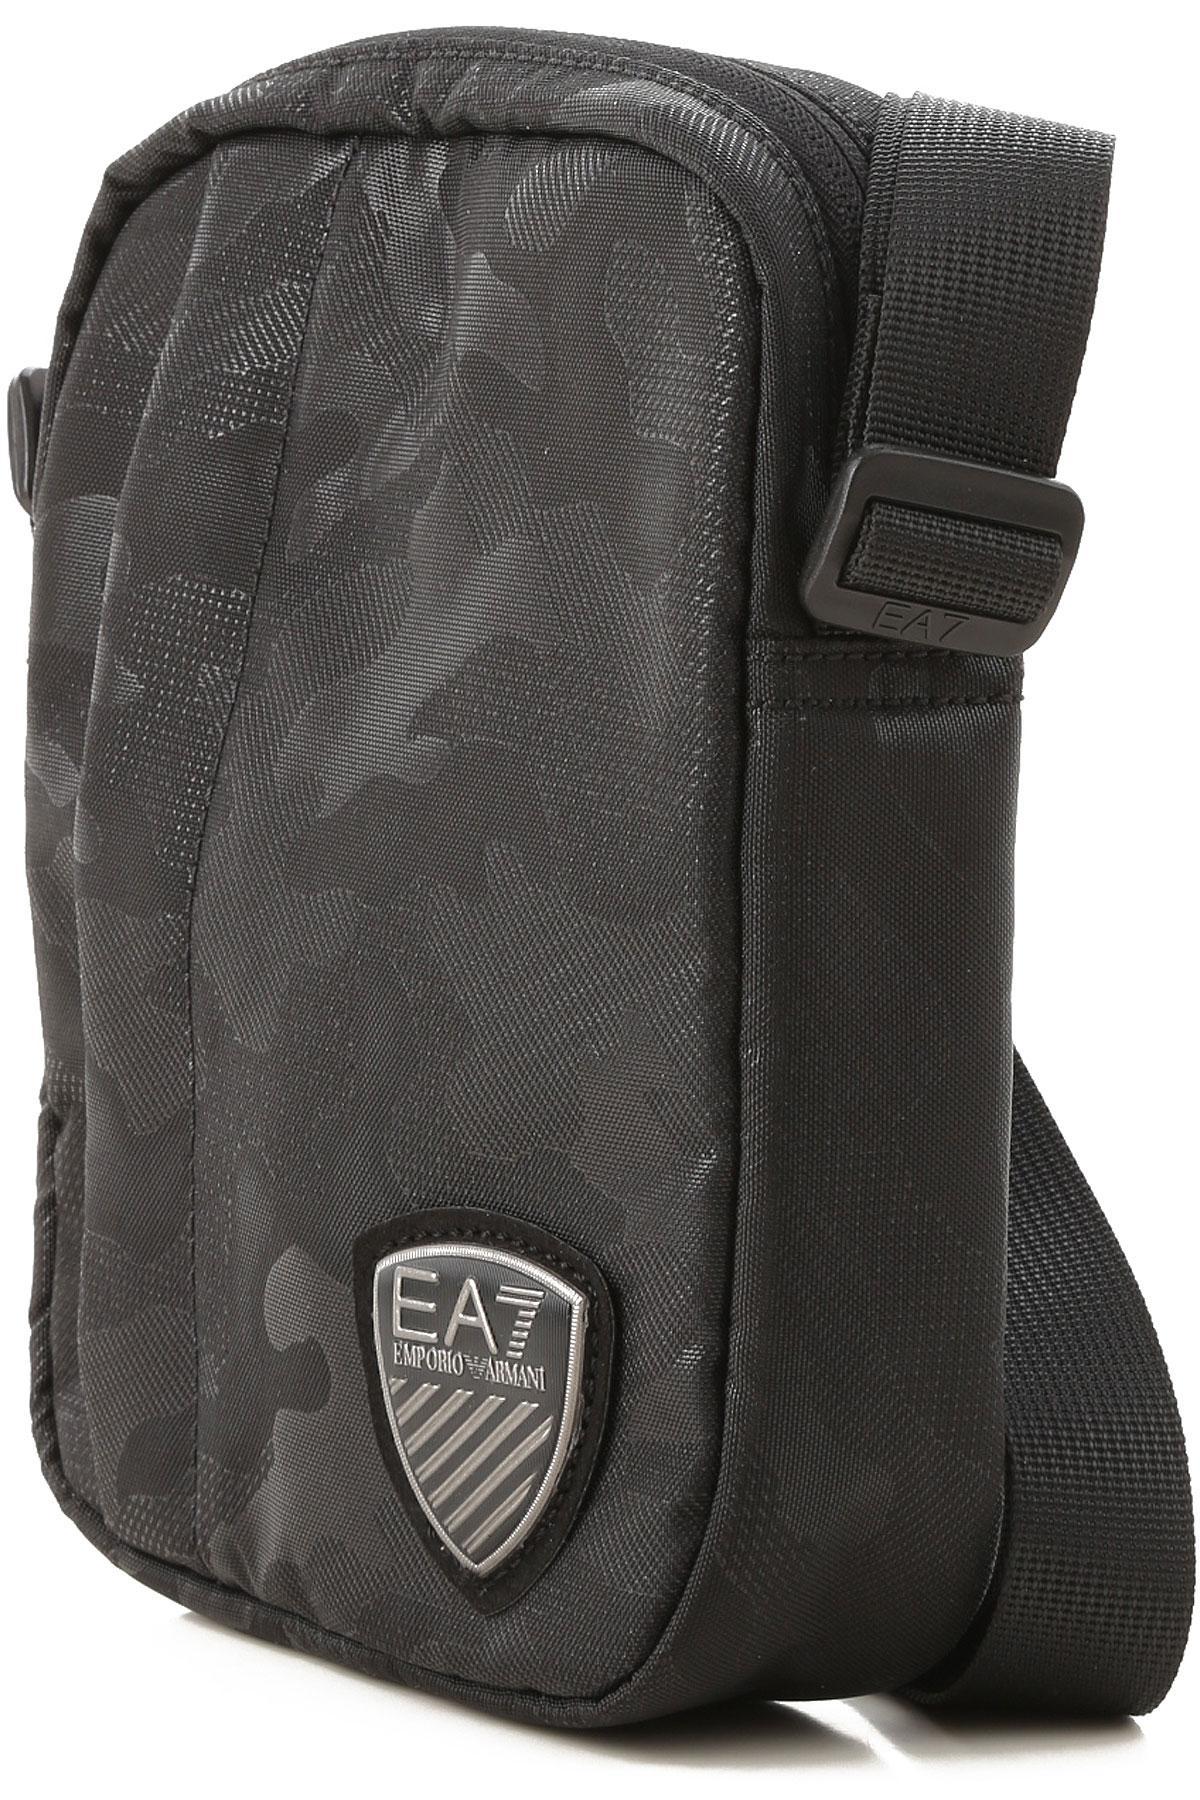 Emporio Armani - Black Messenger Bag For Men for Men - Lyst. View fullscreen 11b2e2ec425bf